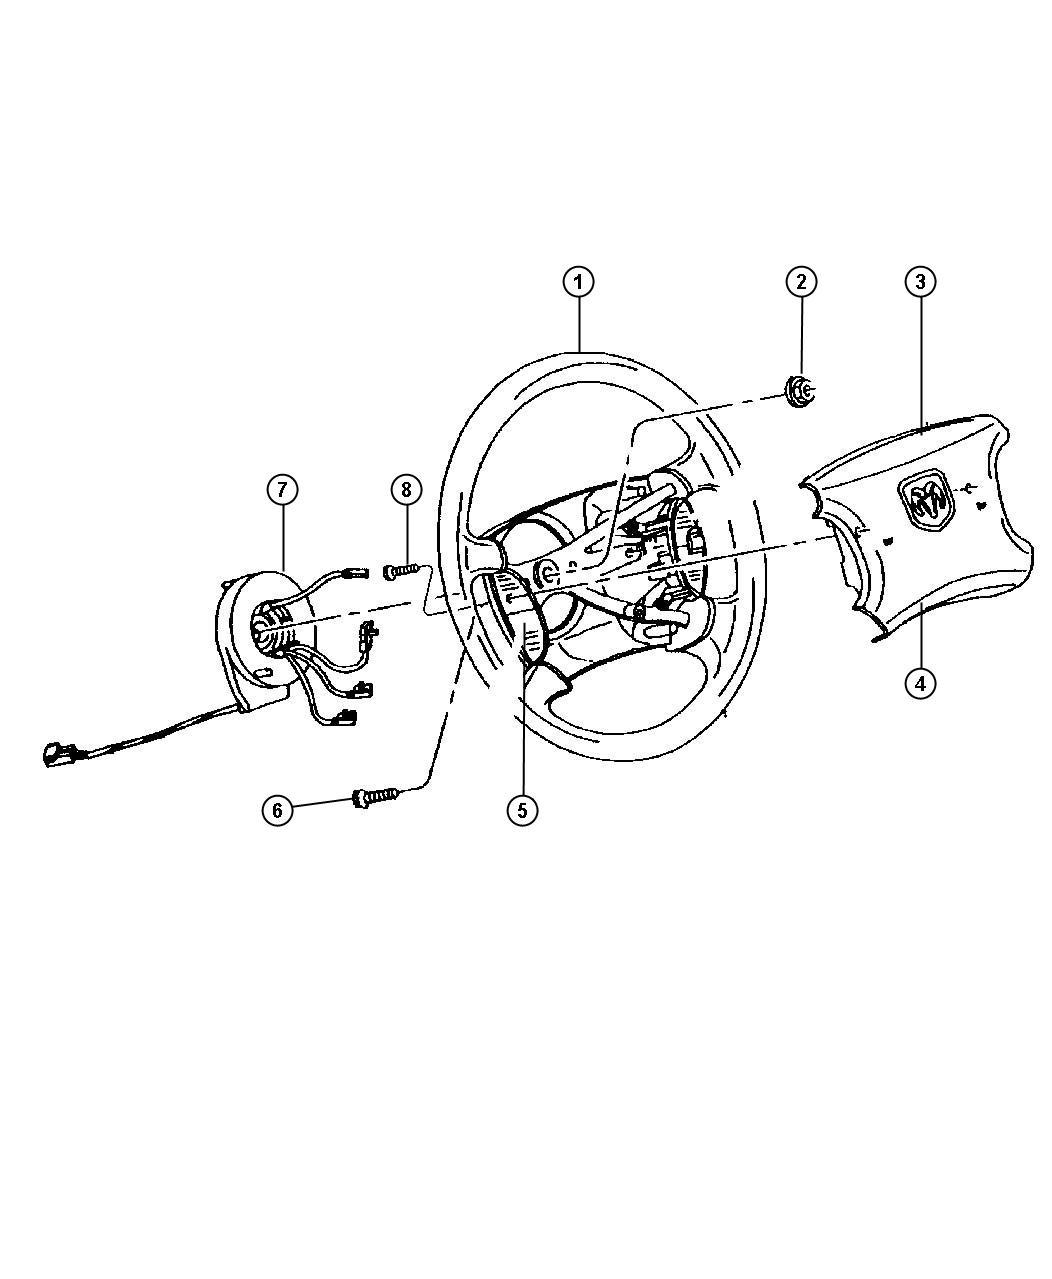 87 k5 blazer wiring diagram hei install | wiring diagram database blazer  wiring diagram starter on